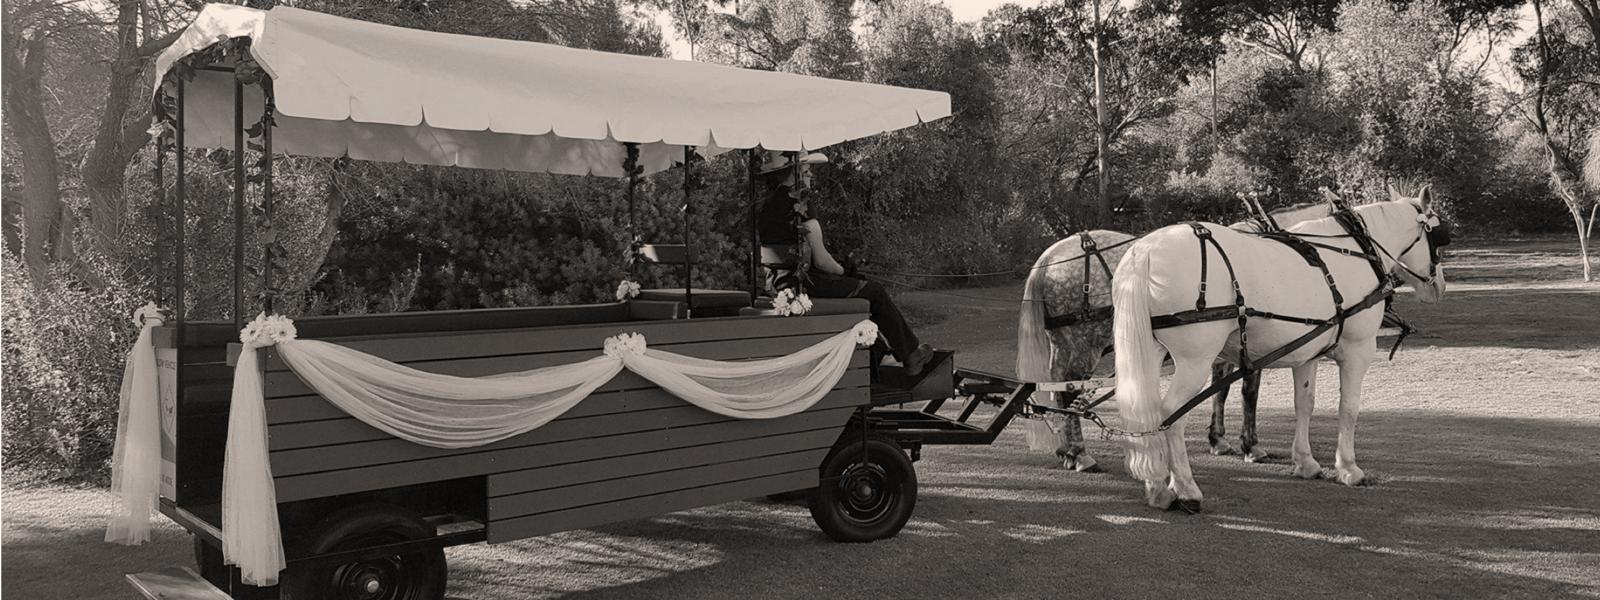 Perth-Horse-&-Carriage-Wagon